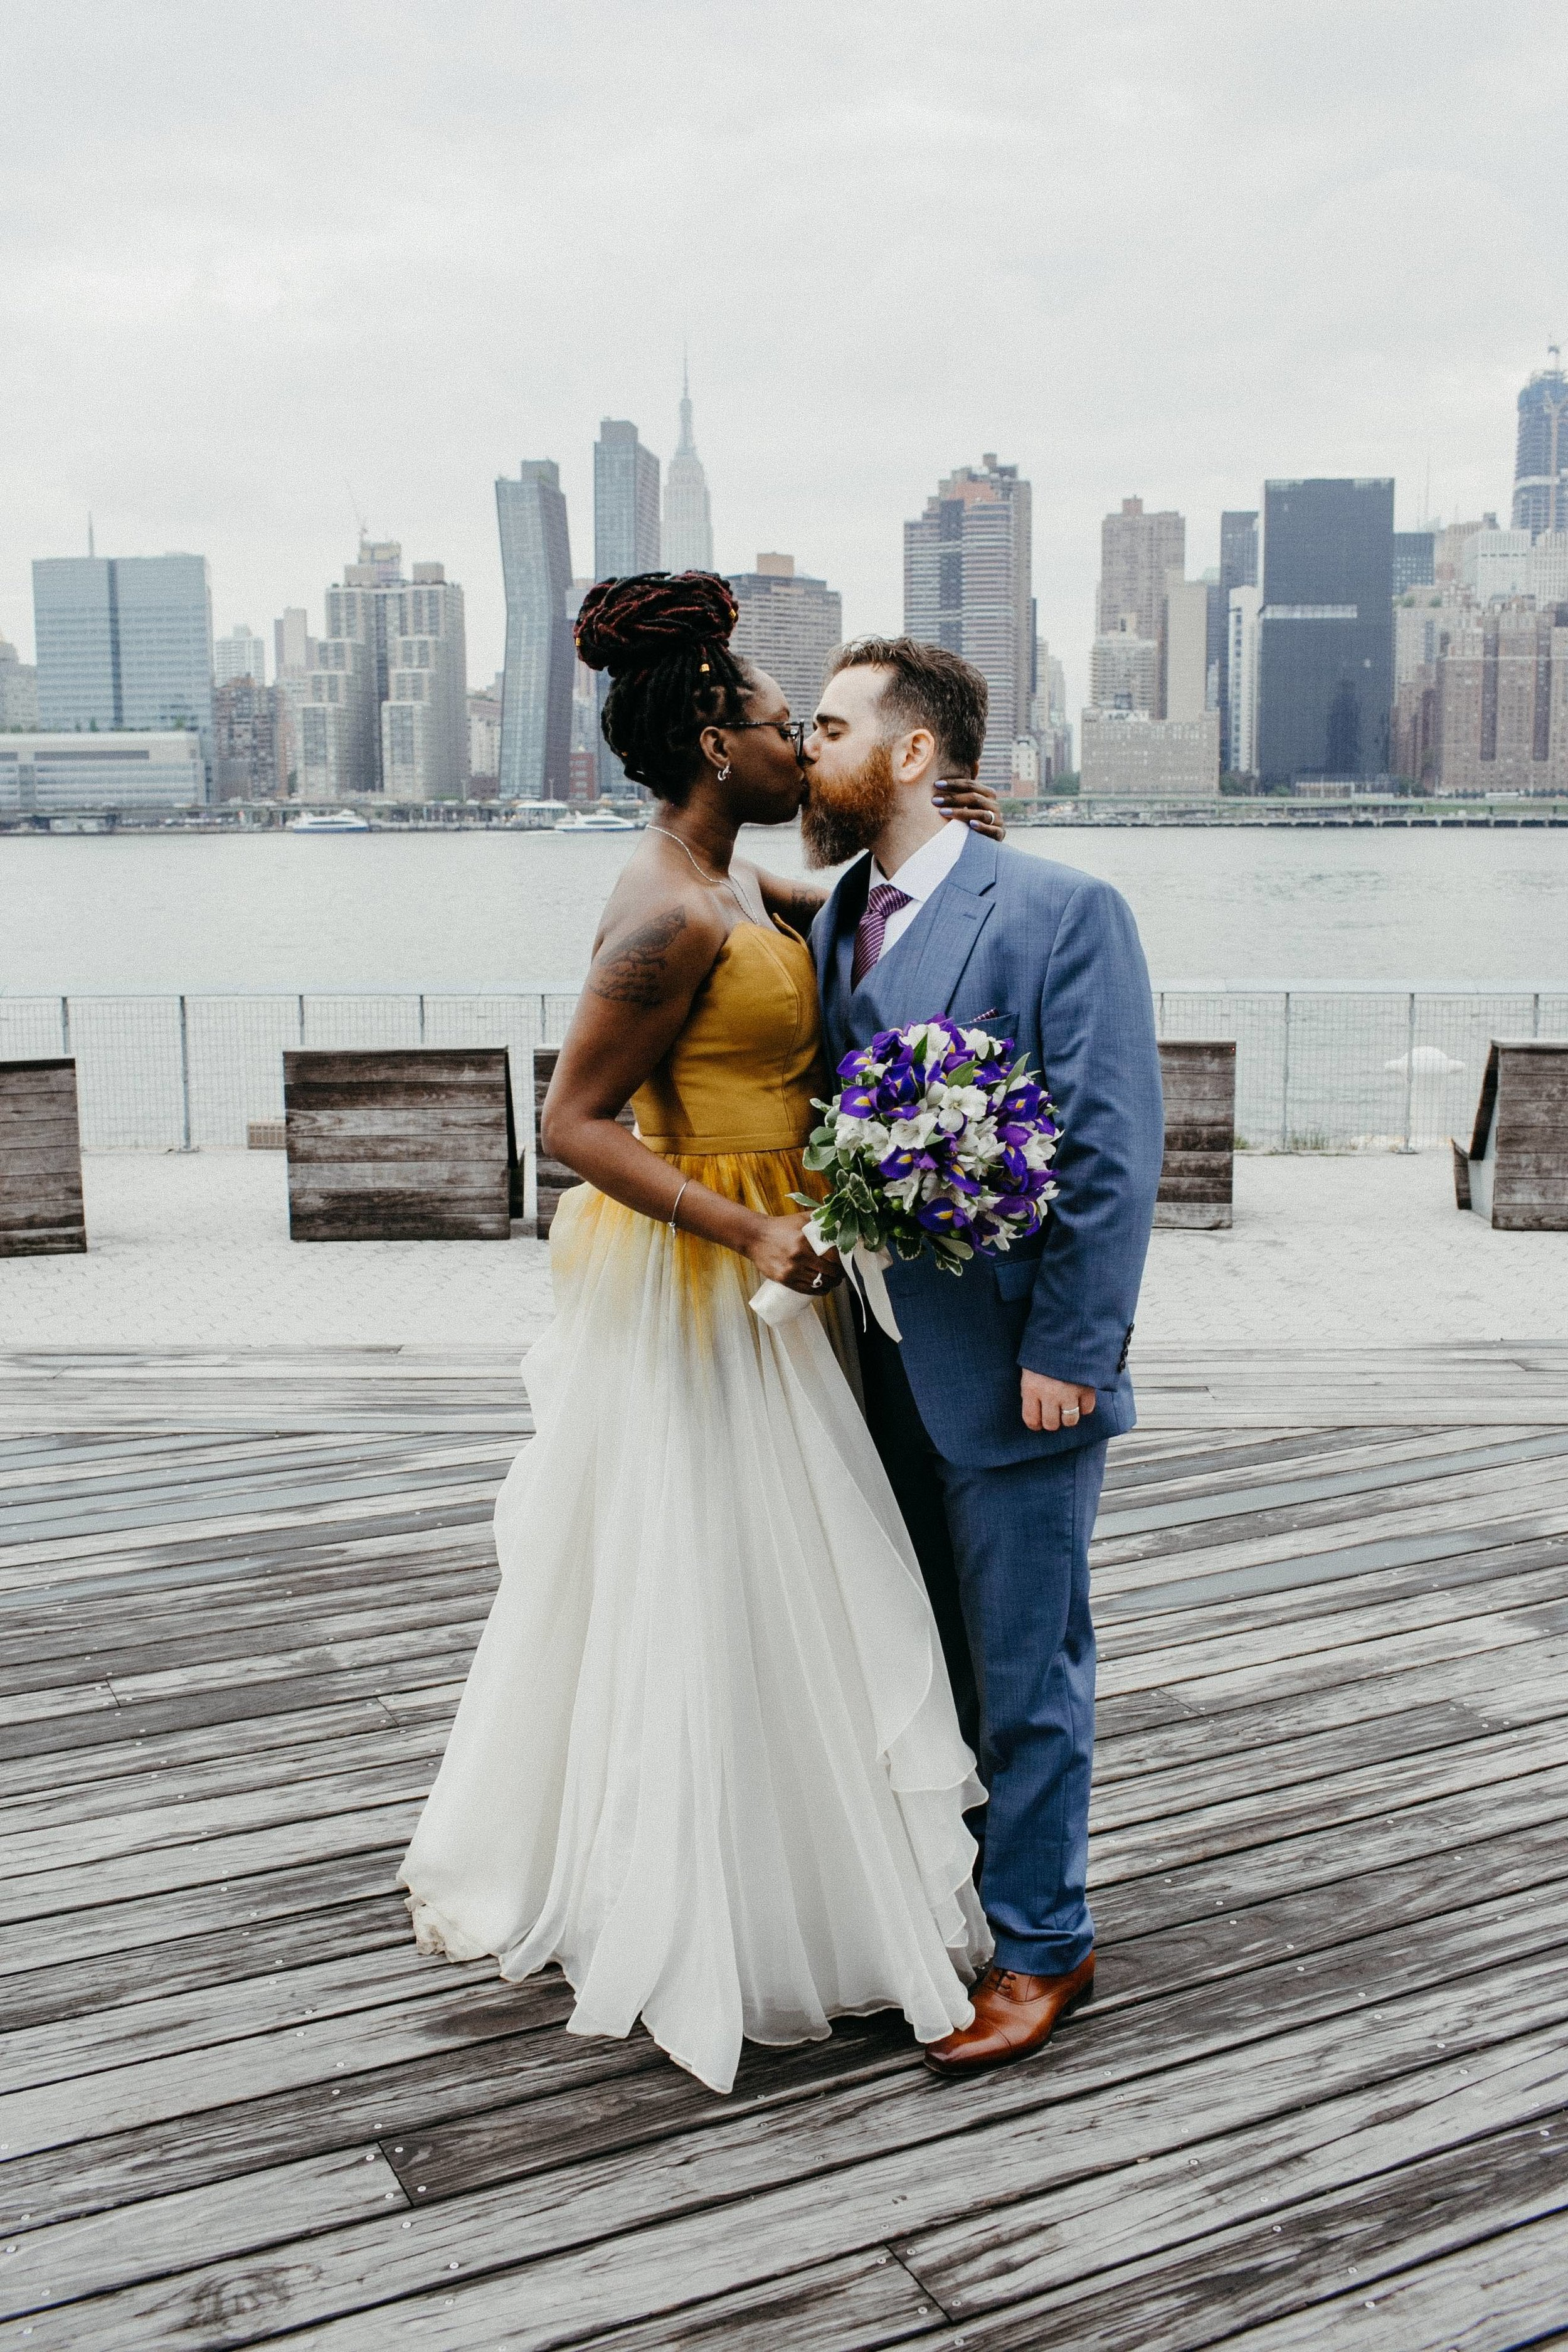 Sevlynn-Photography-Wedding-LIC-Landing-Maiella-NYC-48.jpg